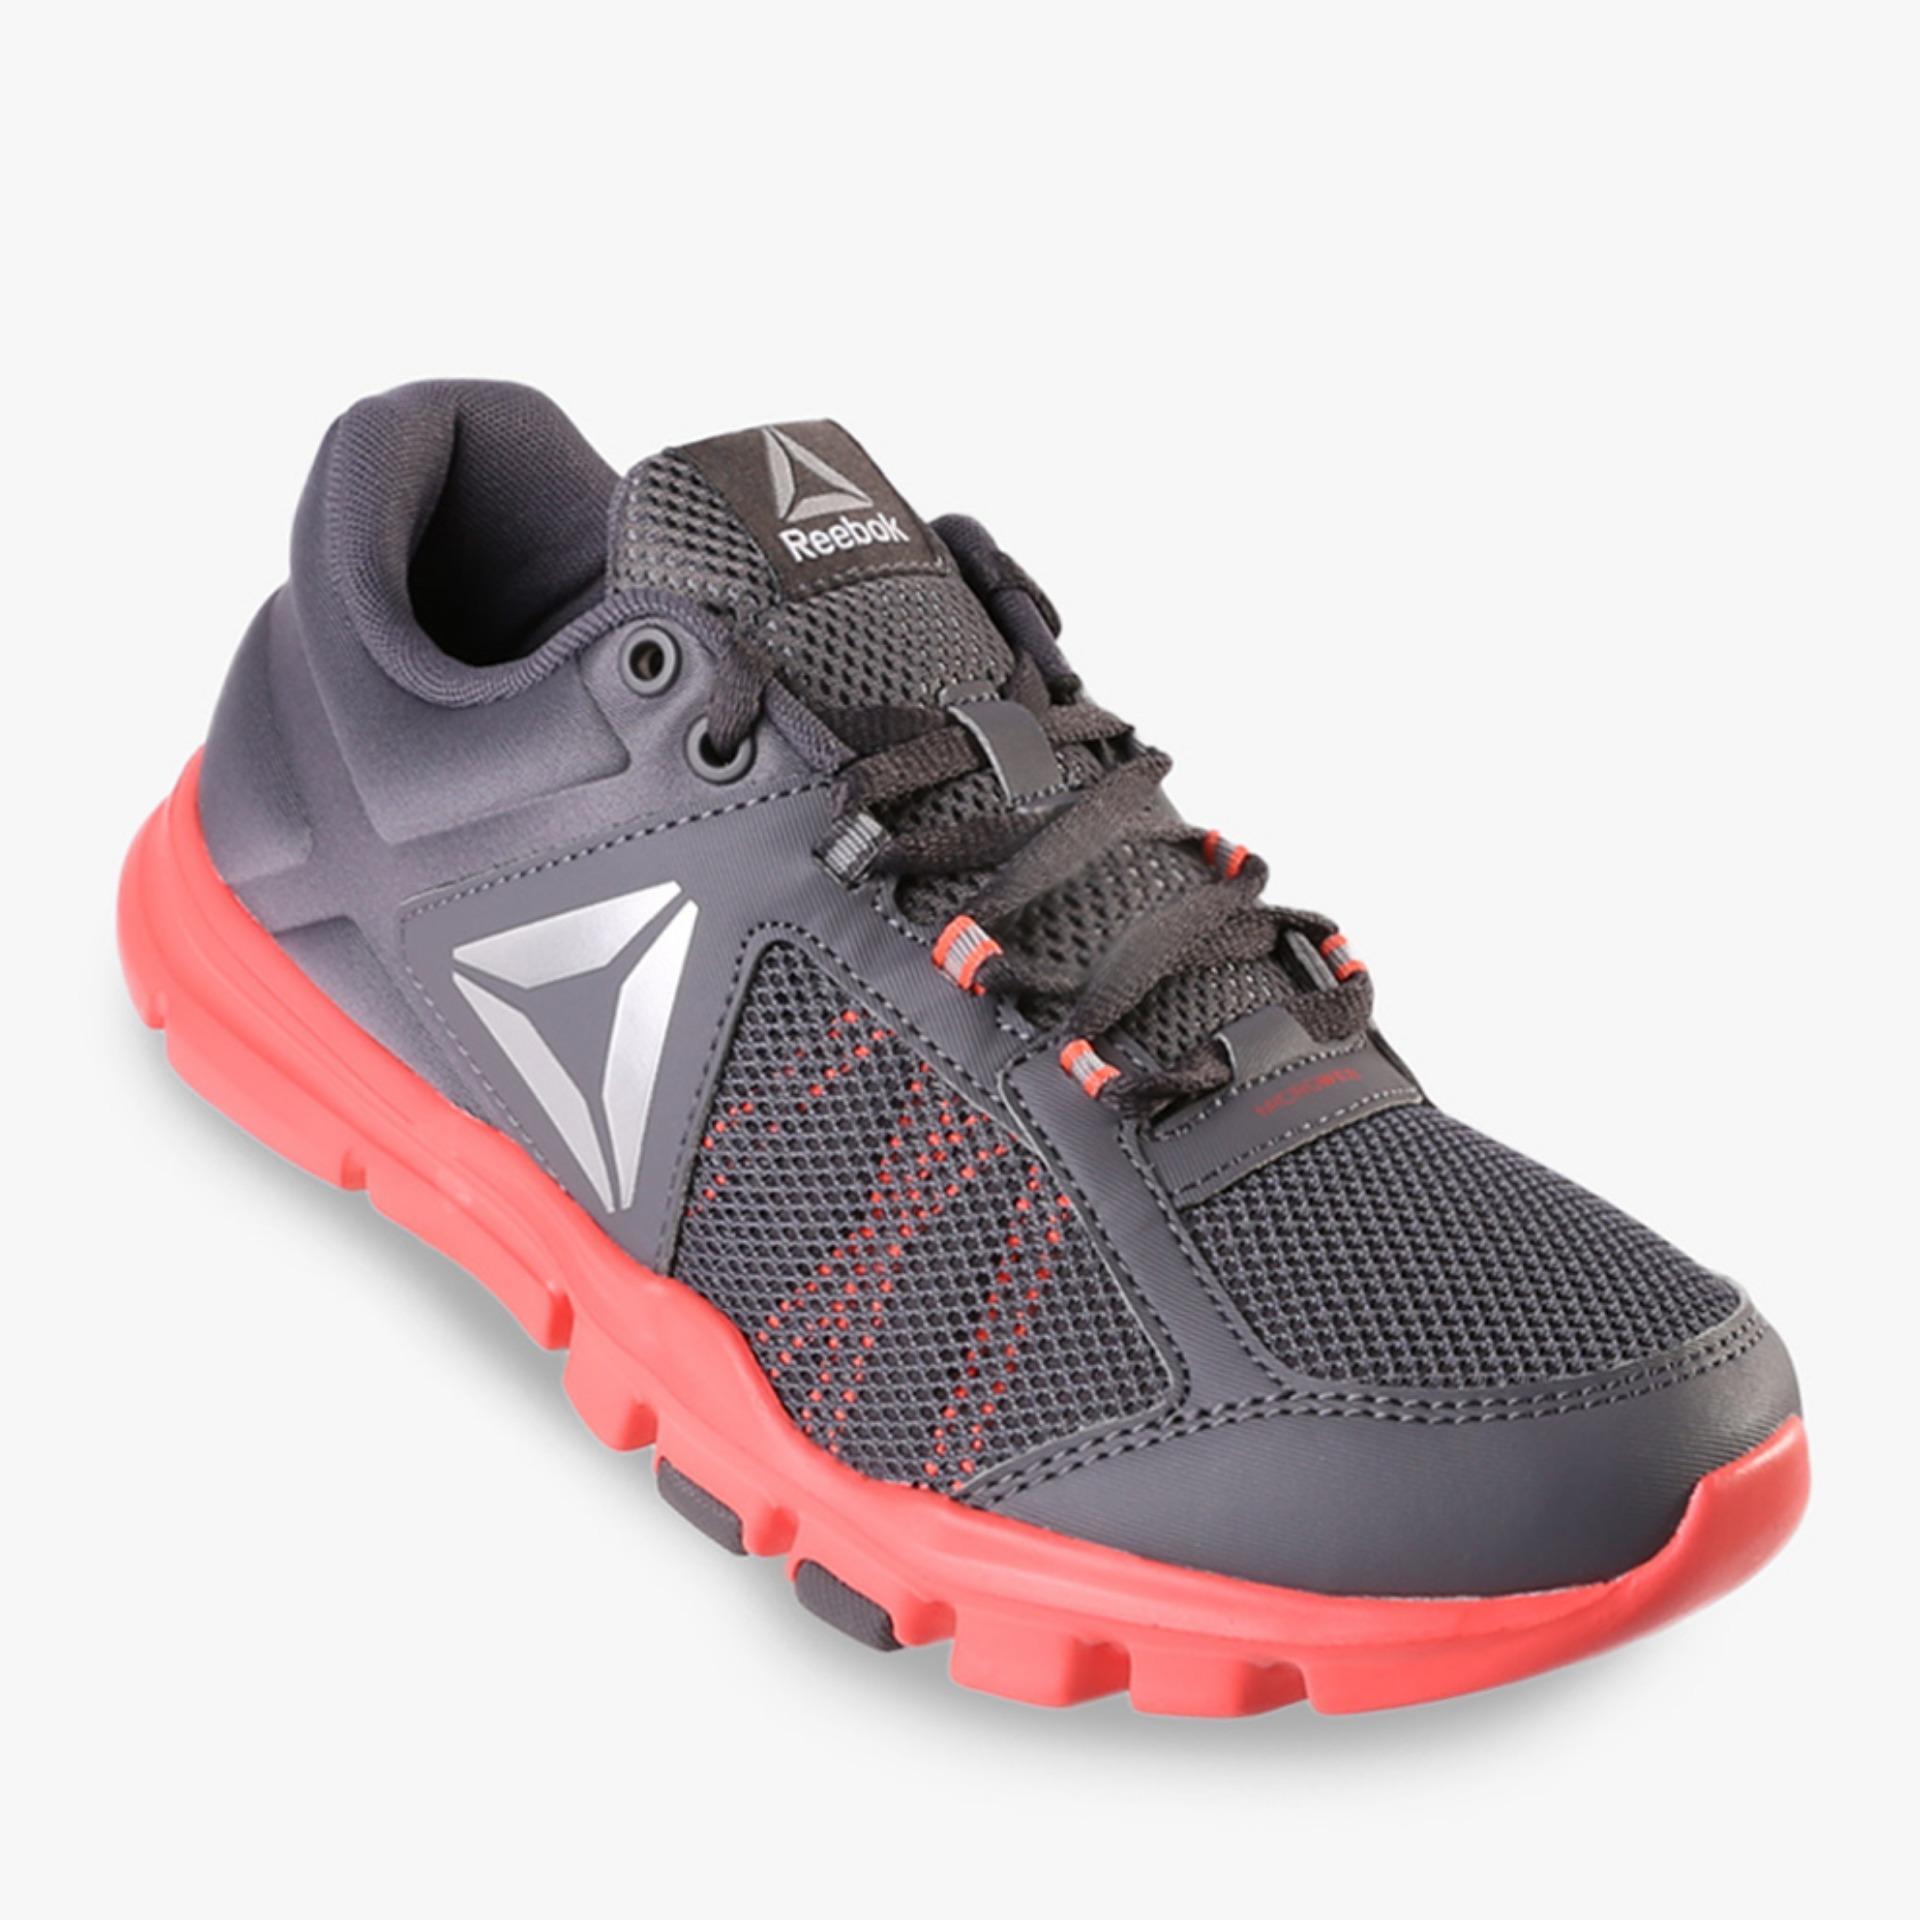 Spesifikasi Reebok Yourflex Trainette 9 Mt Women S Training Shoes Abu Abu Baru